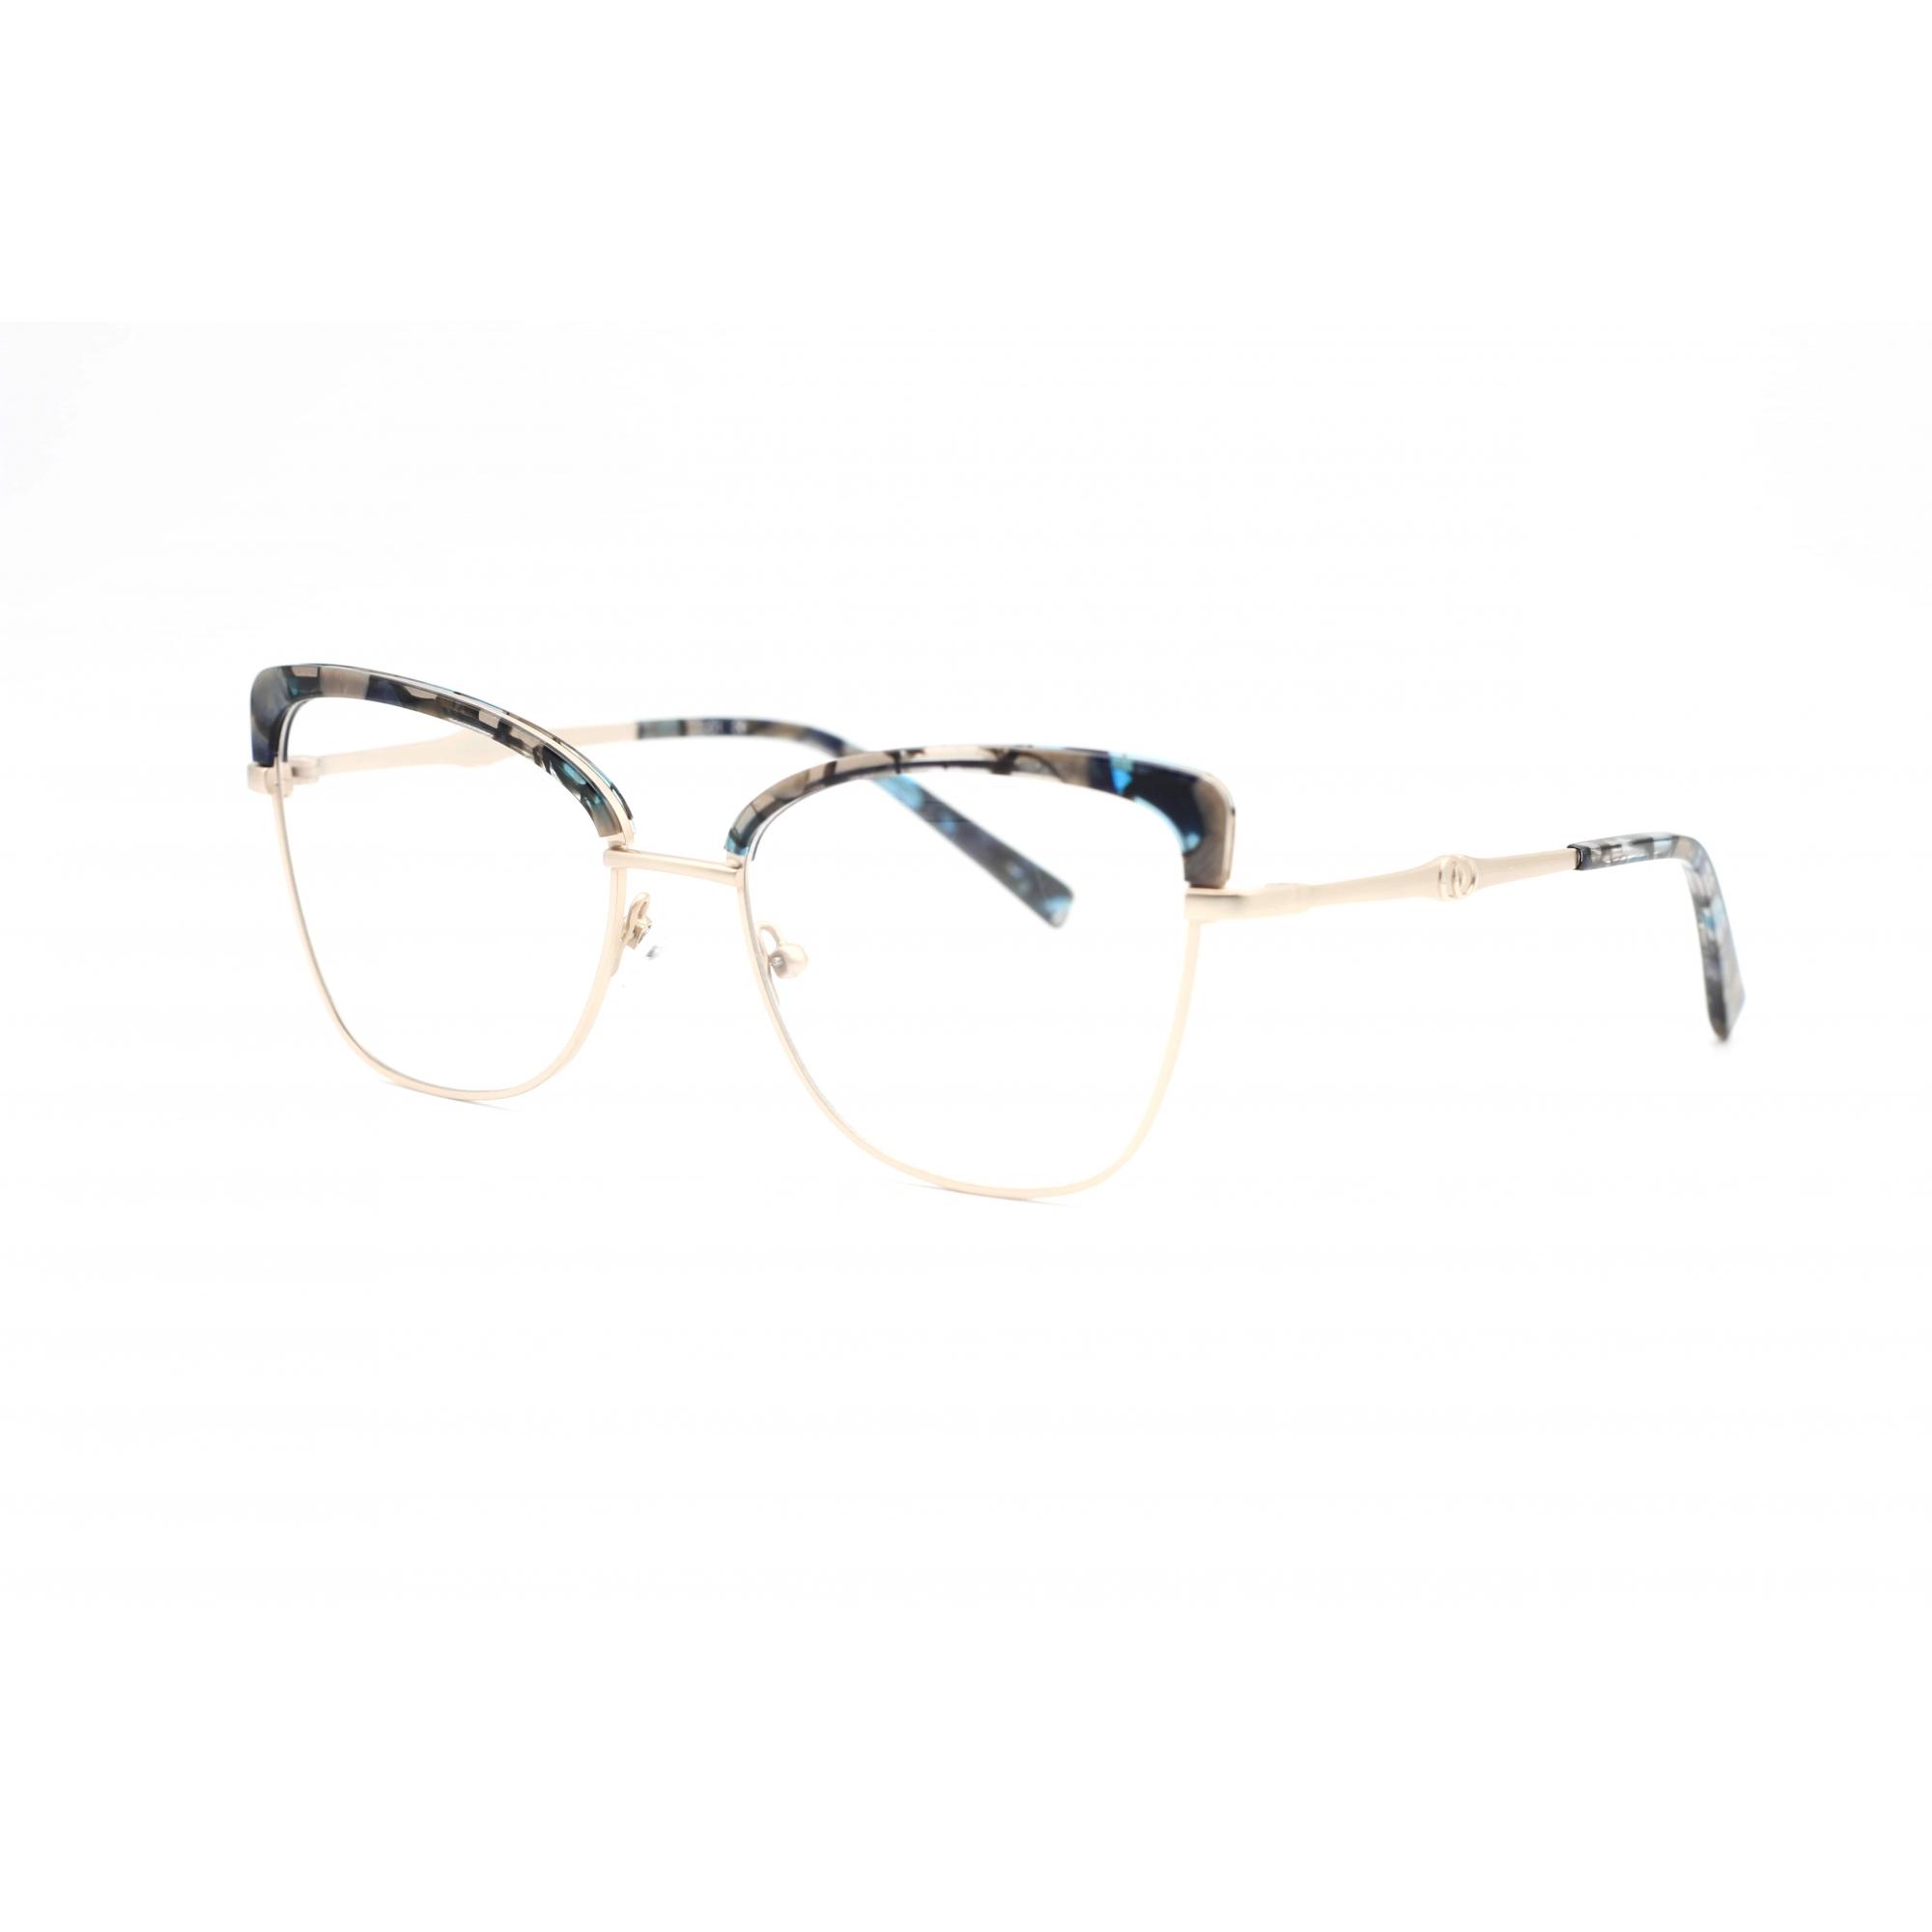 Armação para óculos marca Josefine Ref MJ4631 C1 55